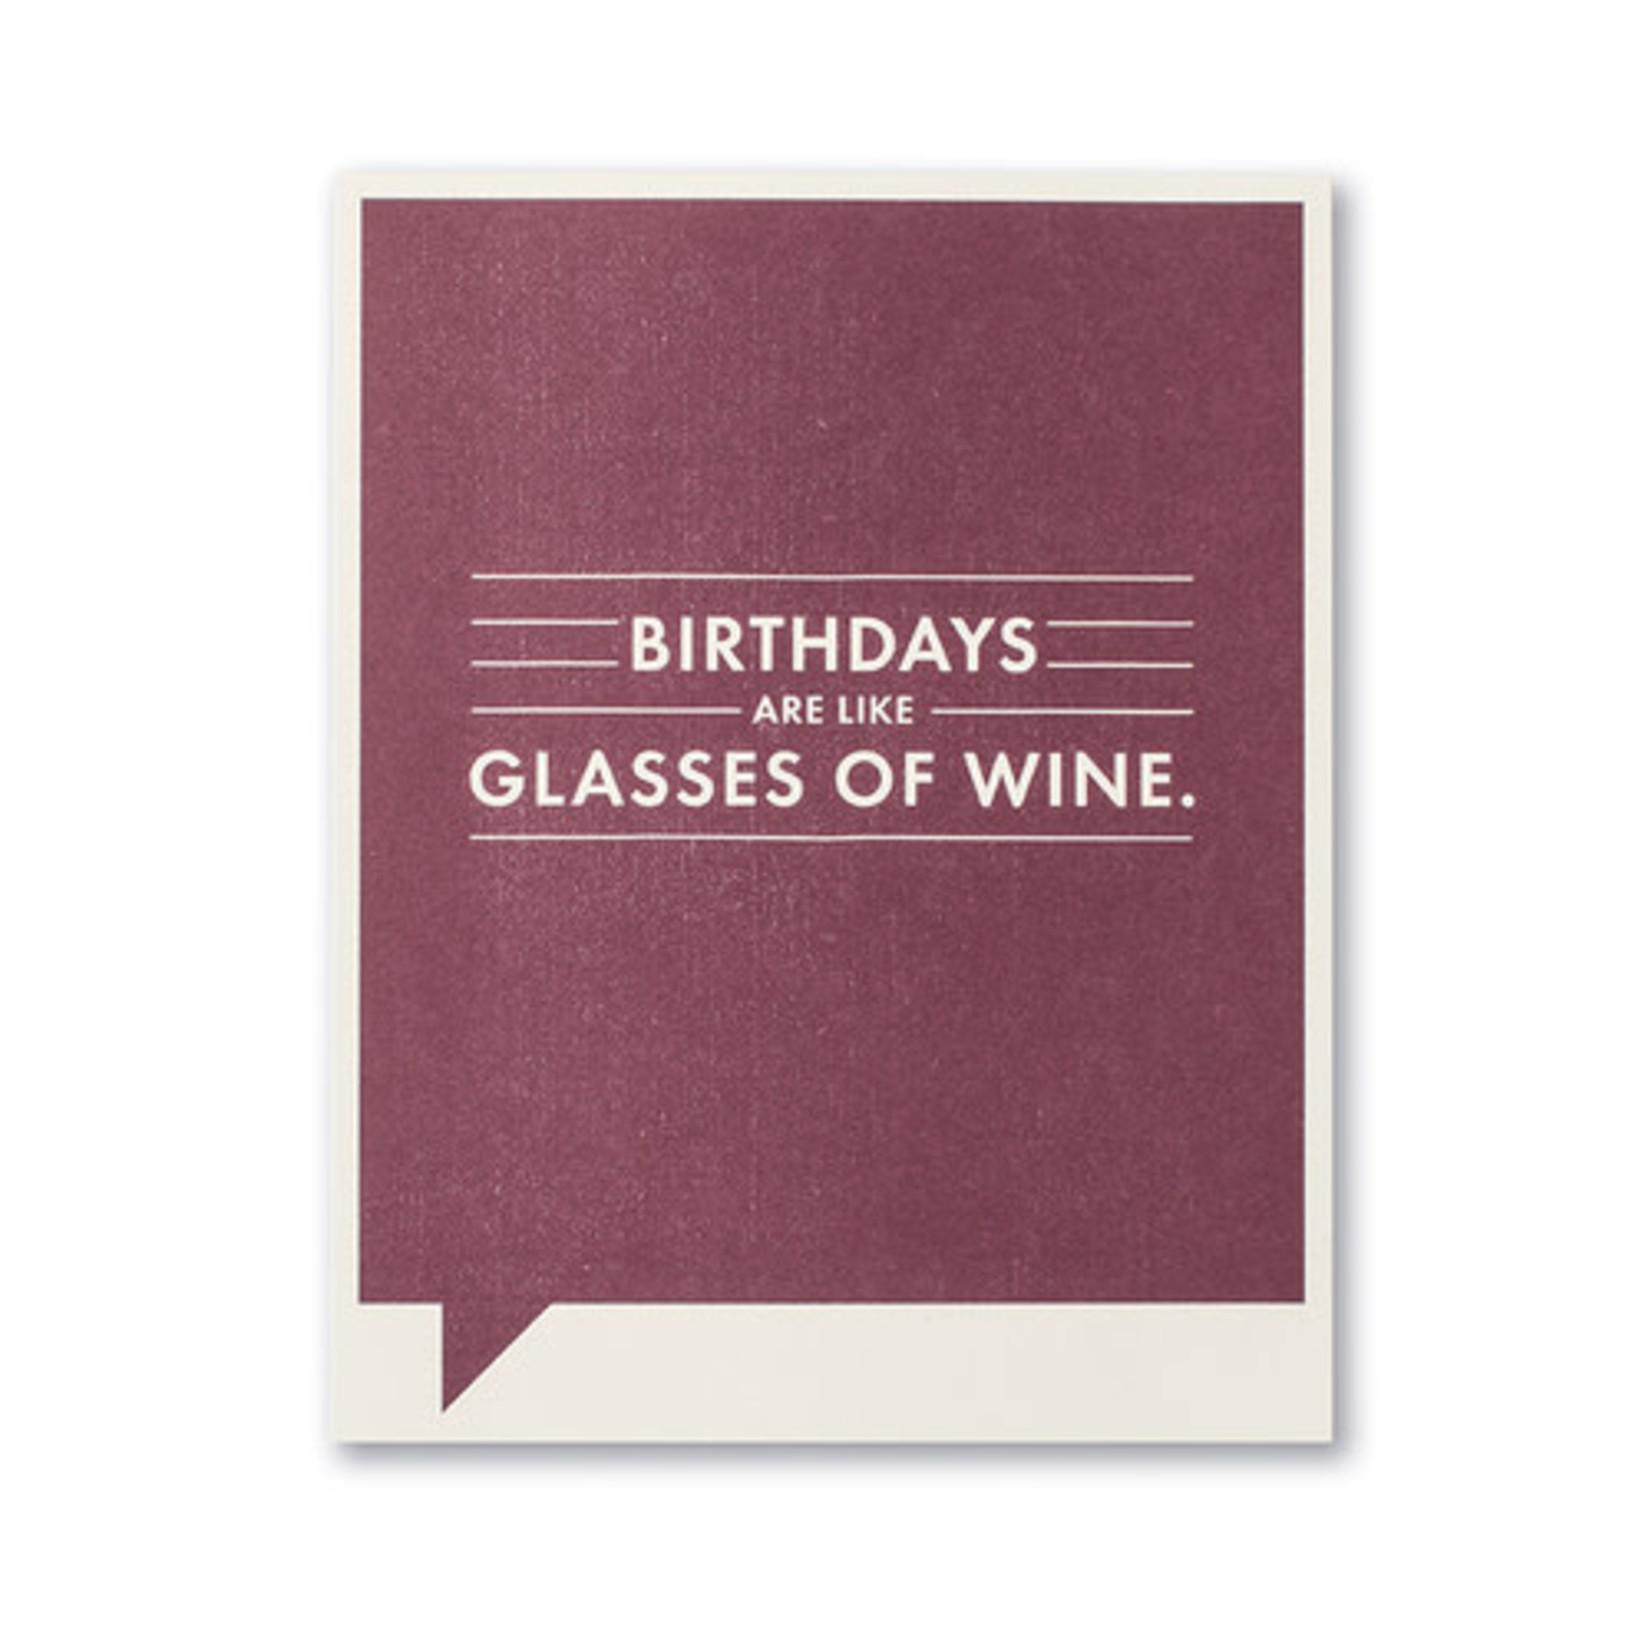 BIRTHDAYS ARE LIKE GLASSES OF WINE CARD